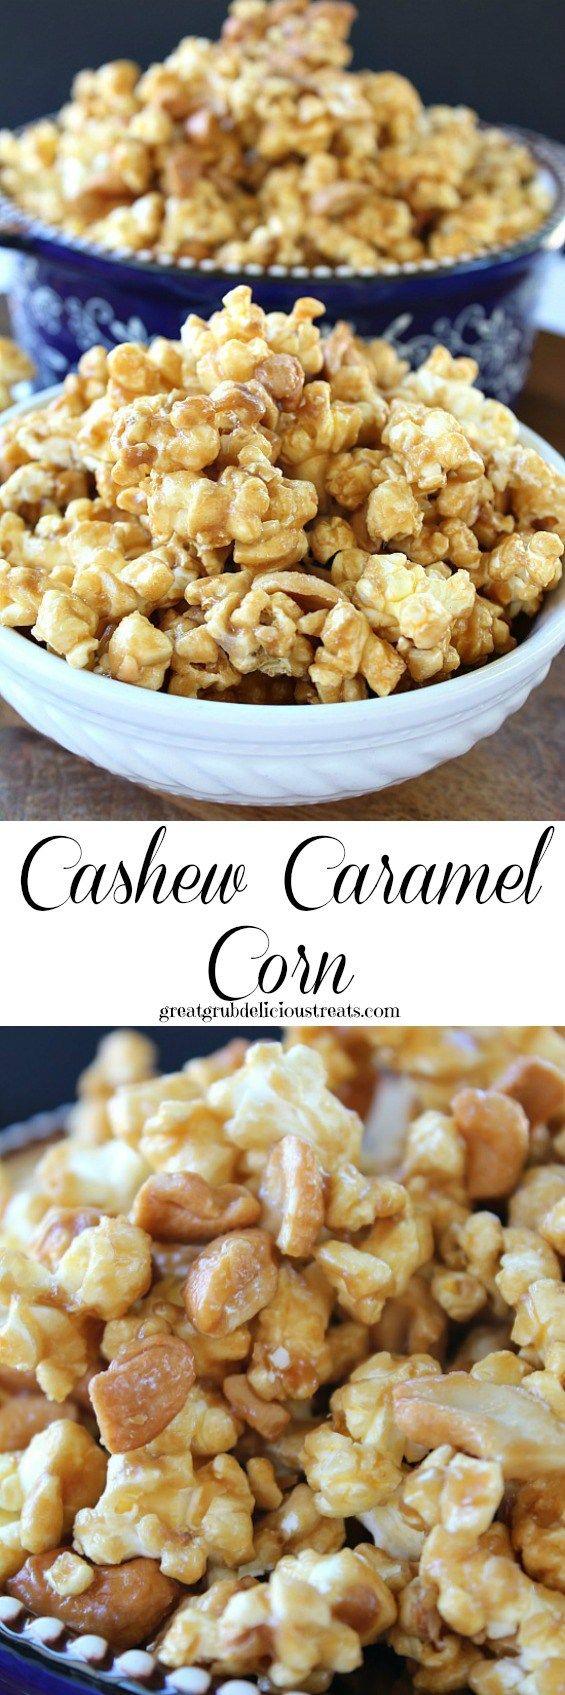 Cashew Caramel Corn                                                                                                                                                                                 More